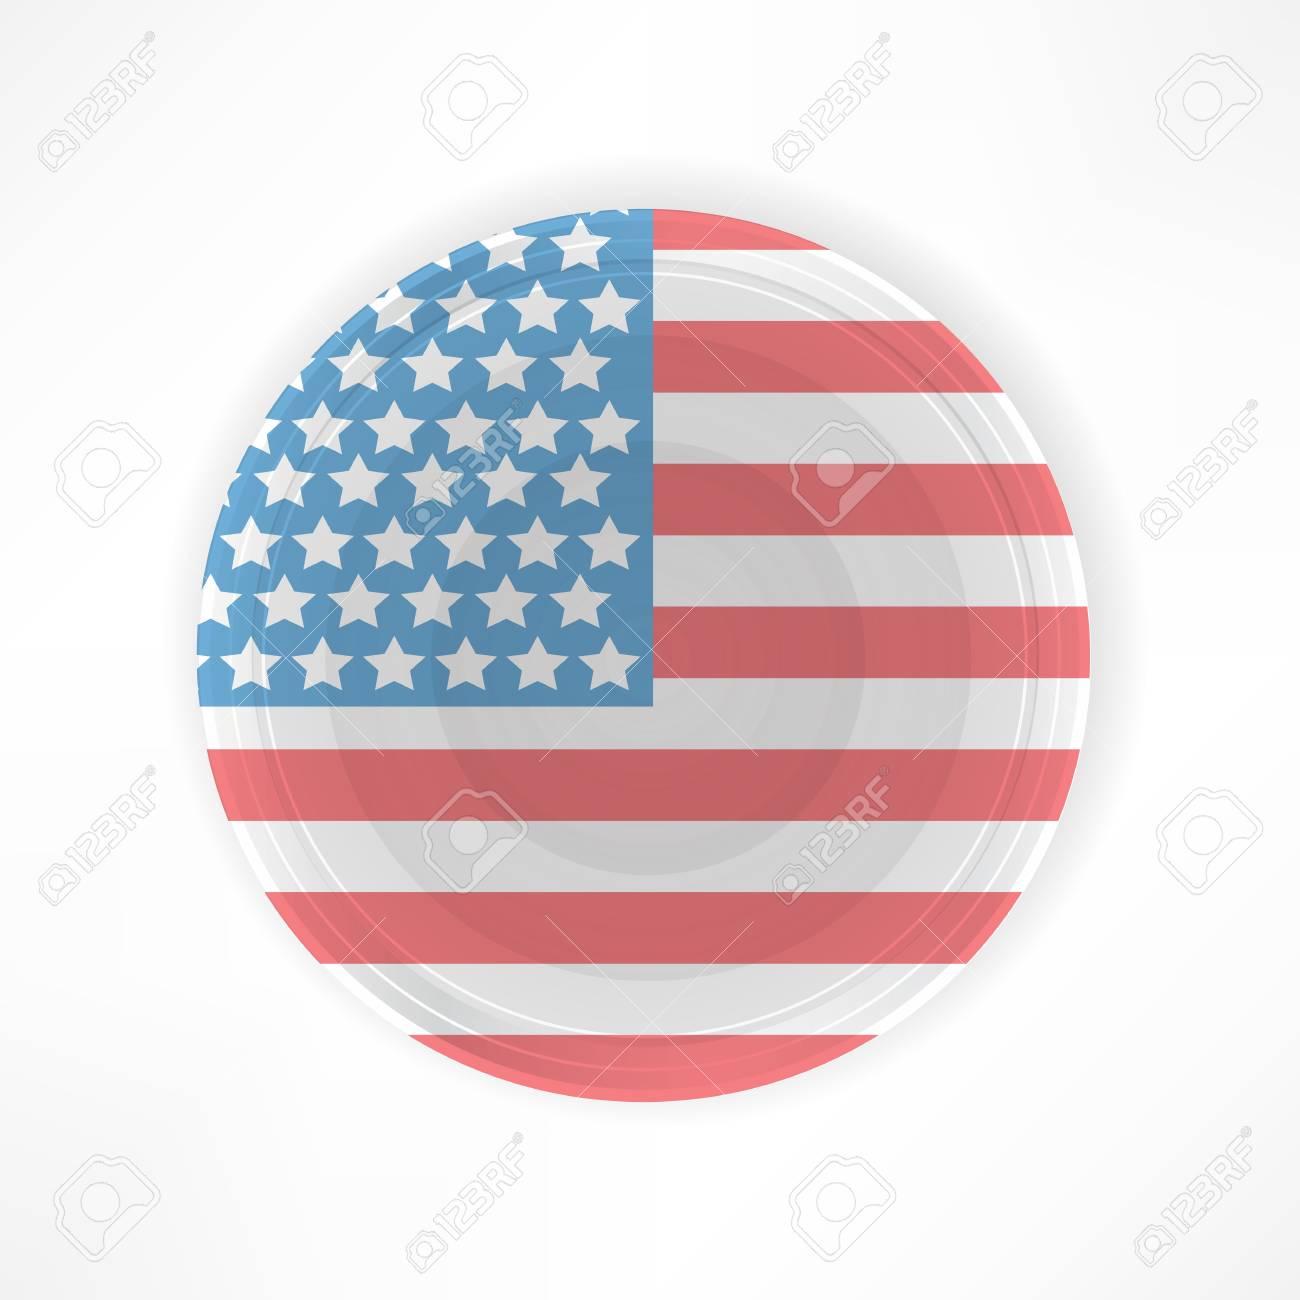 Traditional American Restaurant Stock Vector - 17945574